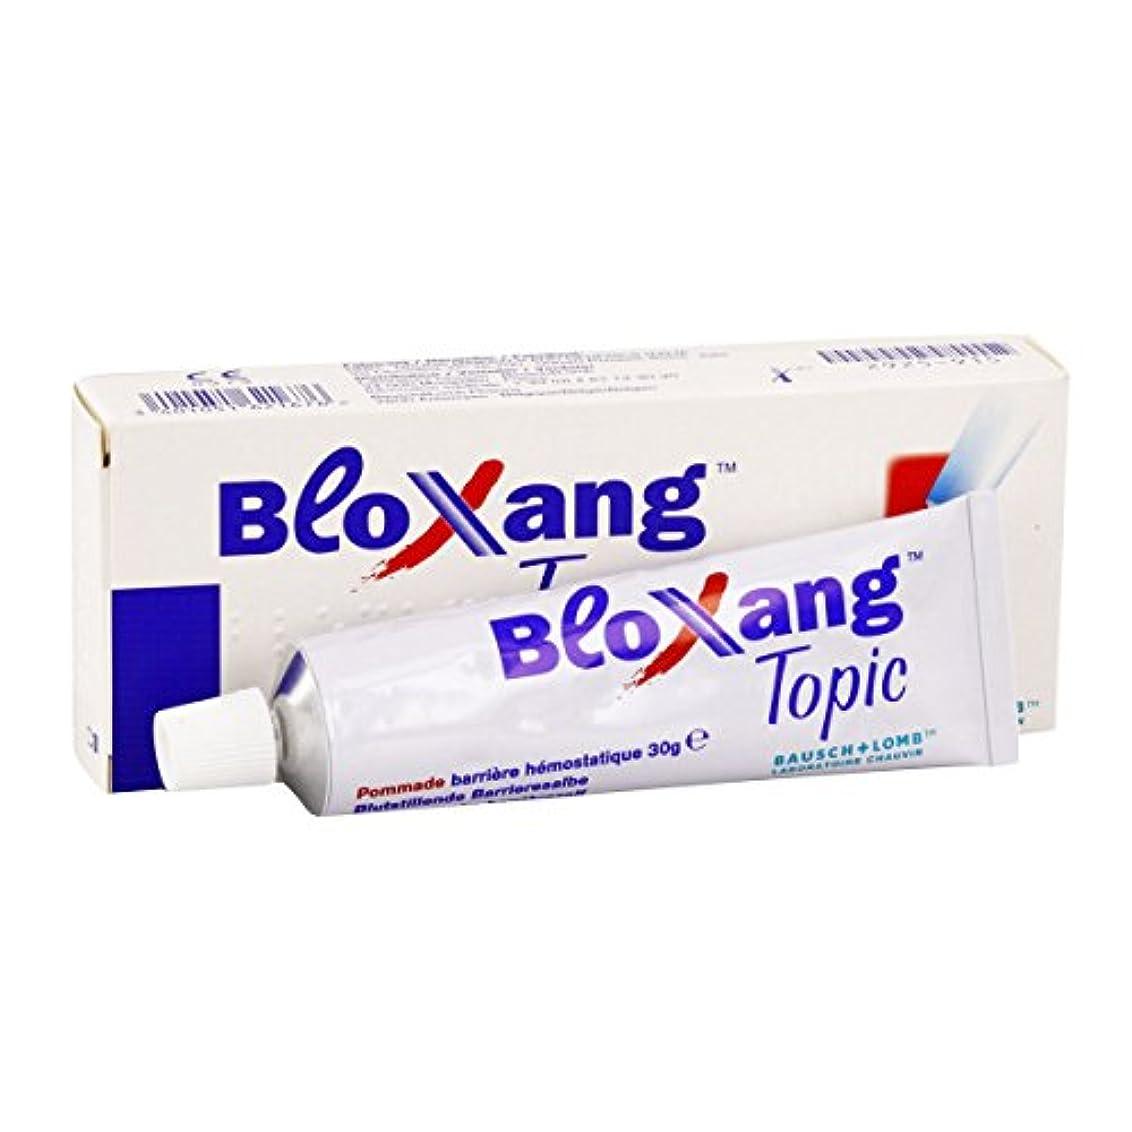 年金受給者動詞重要なBloxang Ointment Hemostatic Barrier 30g [並行輸入品]